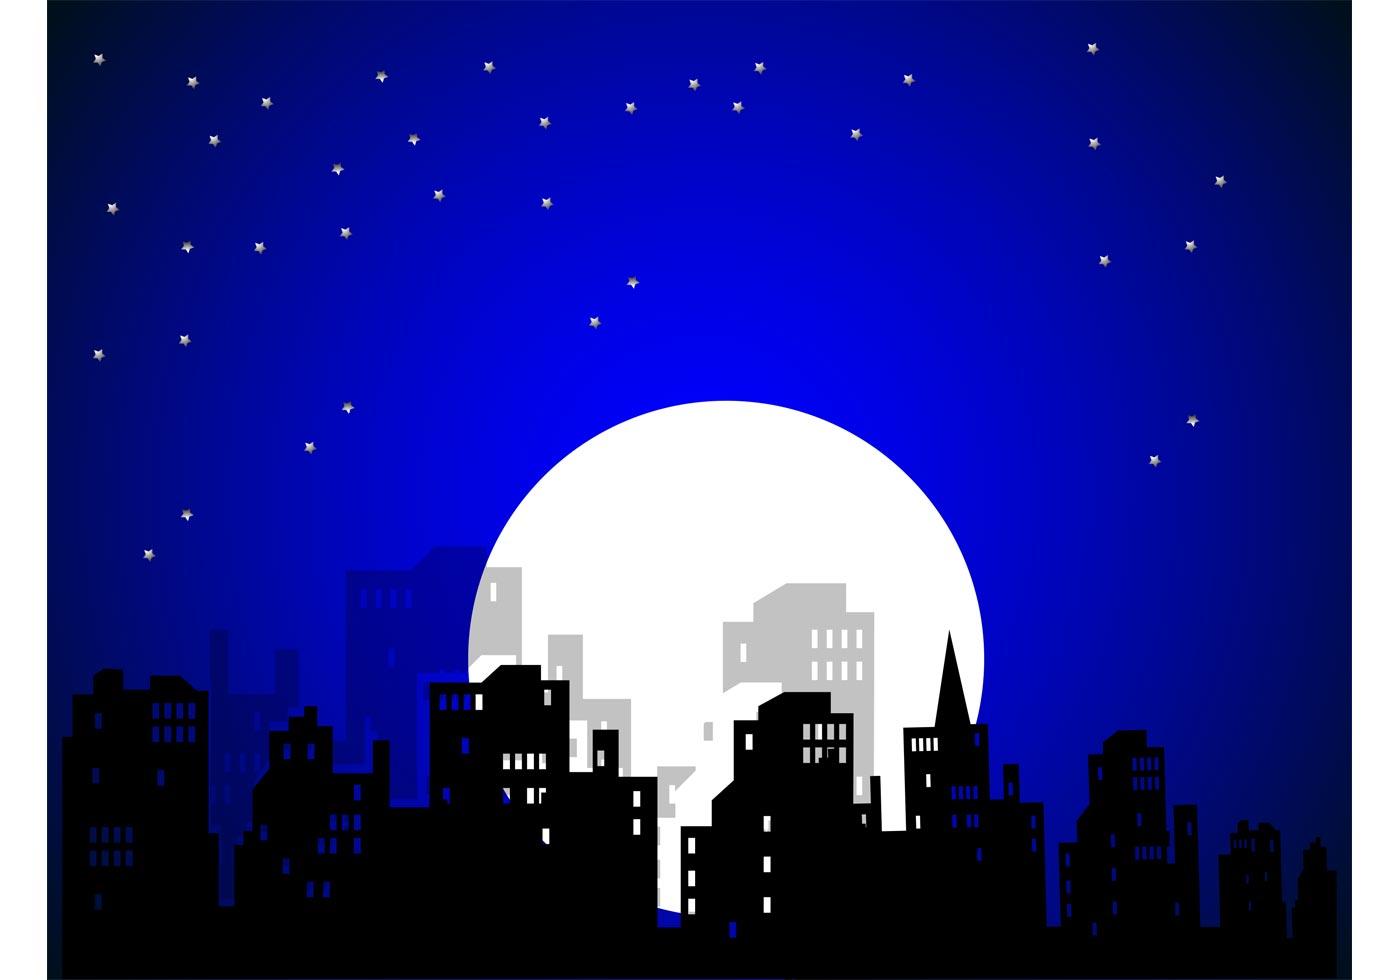 Night Sky Free Vector Art.